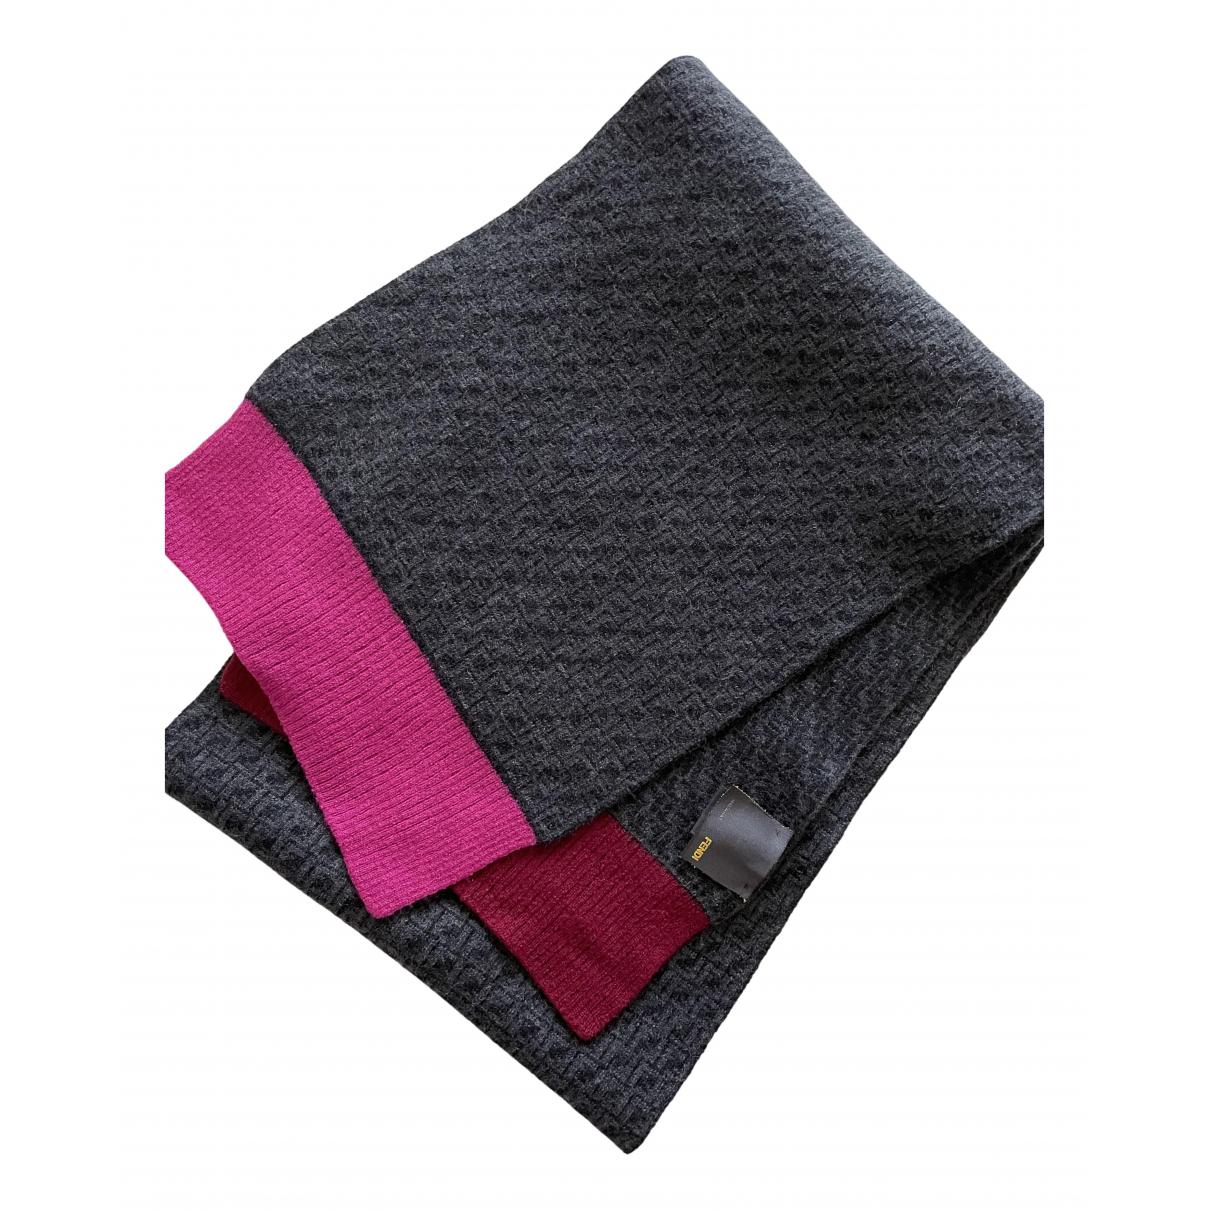 Fendi \N Tuecher, Schal in  Bunt Wolle